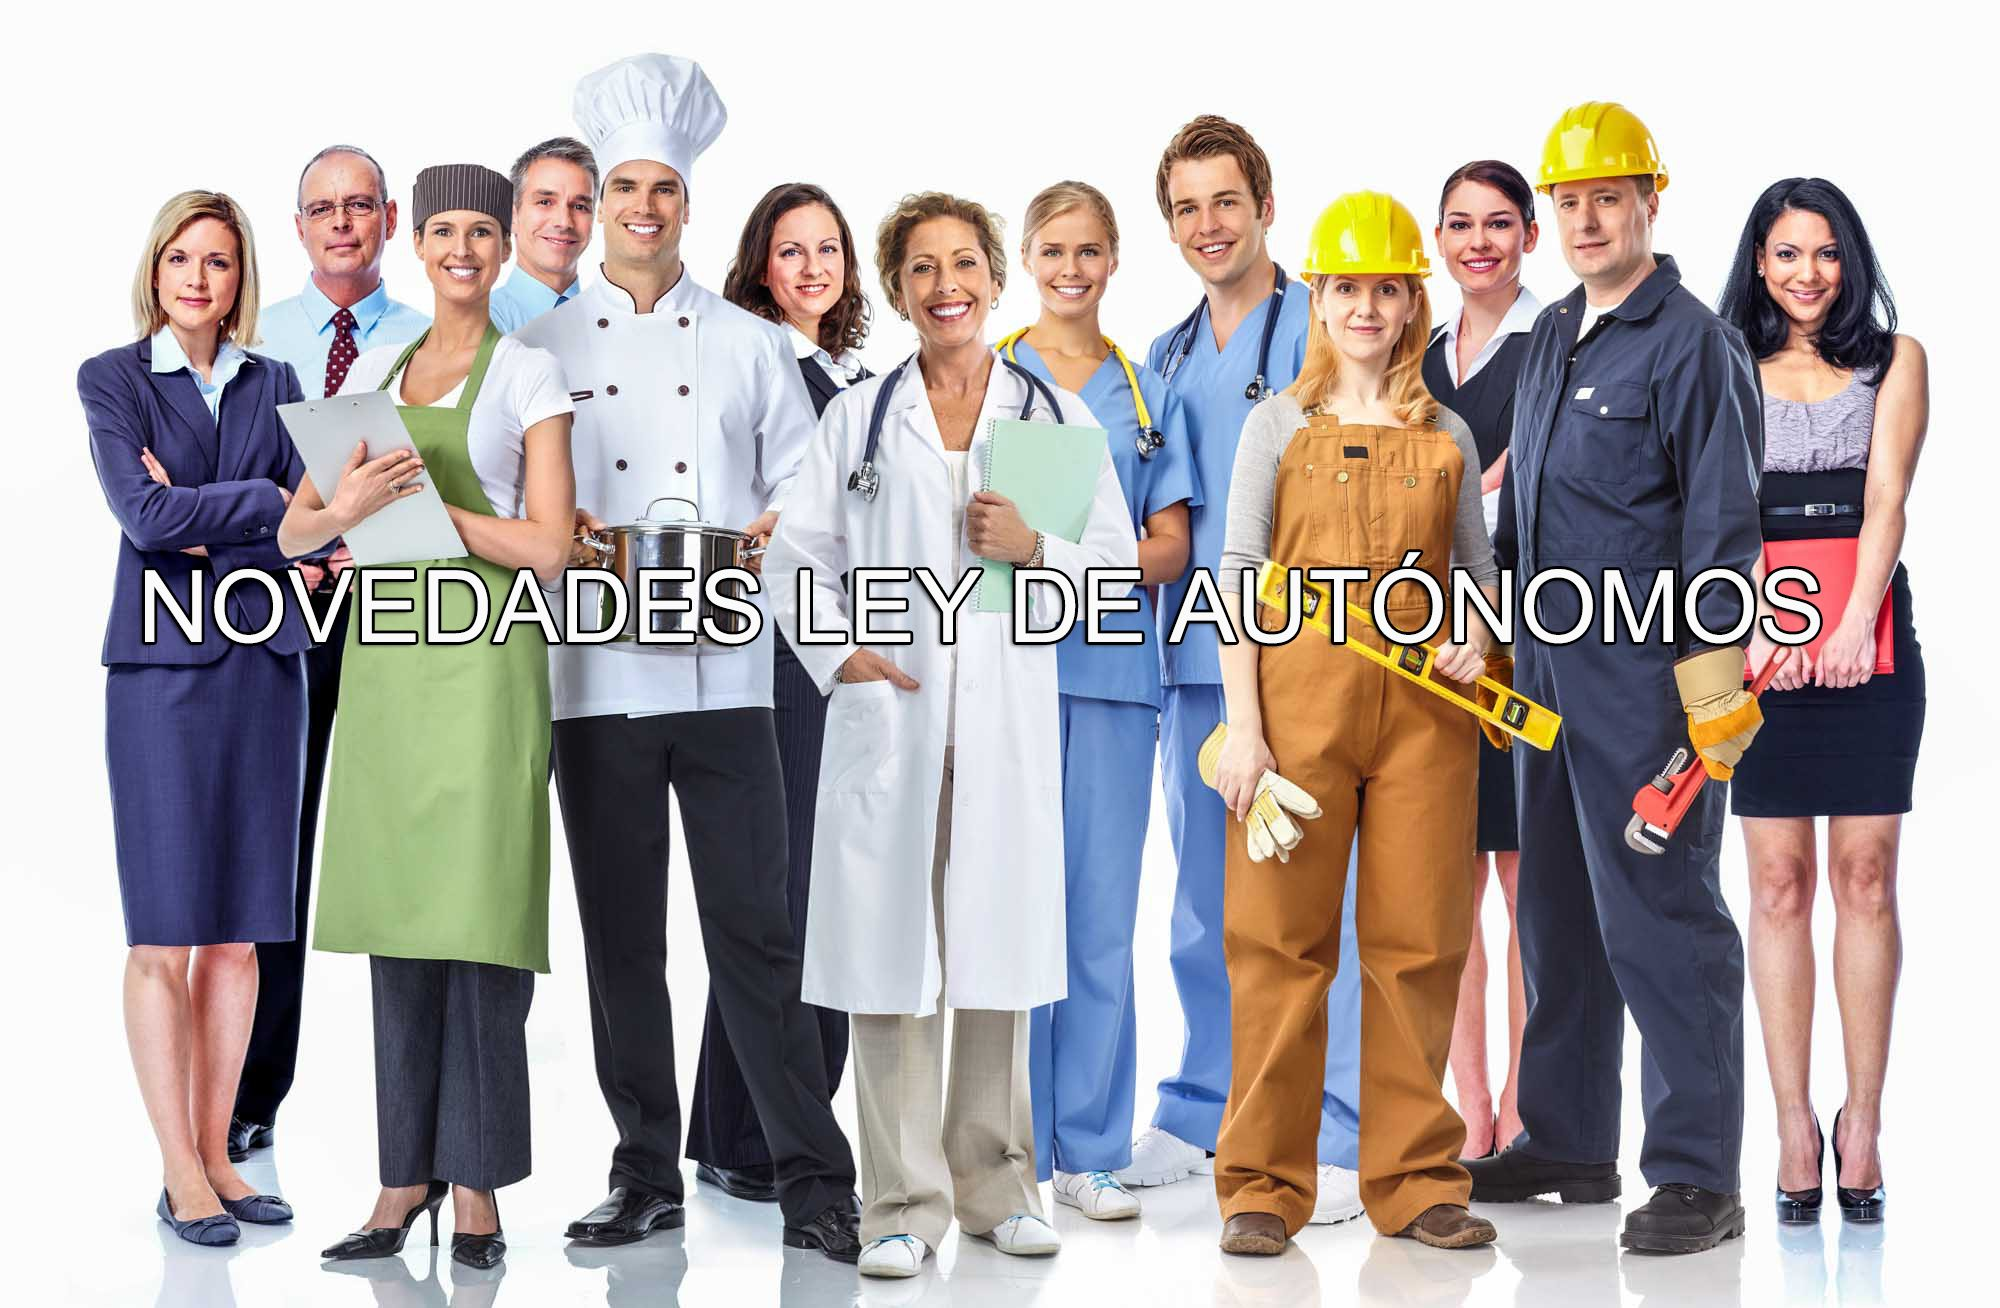 NOVEDADES LEY DE AUTONOMOS